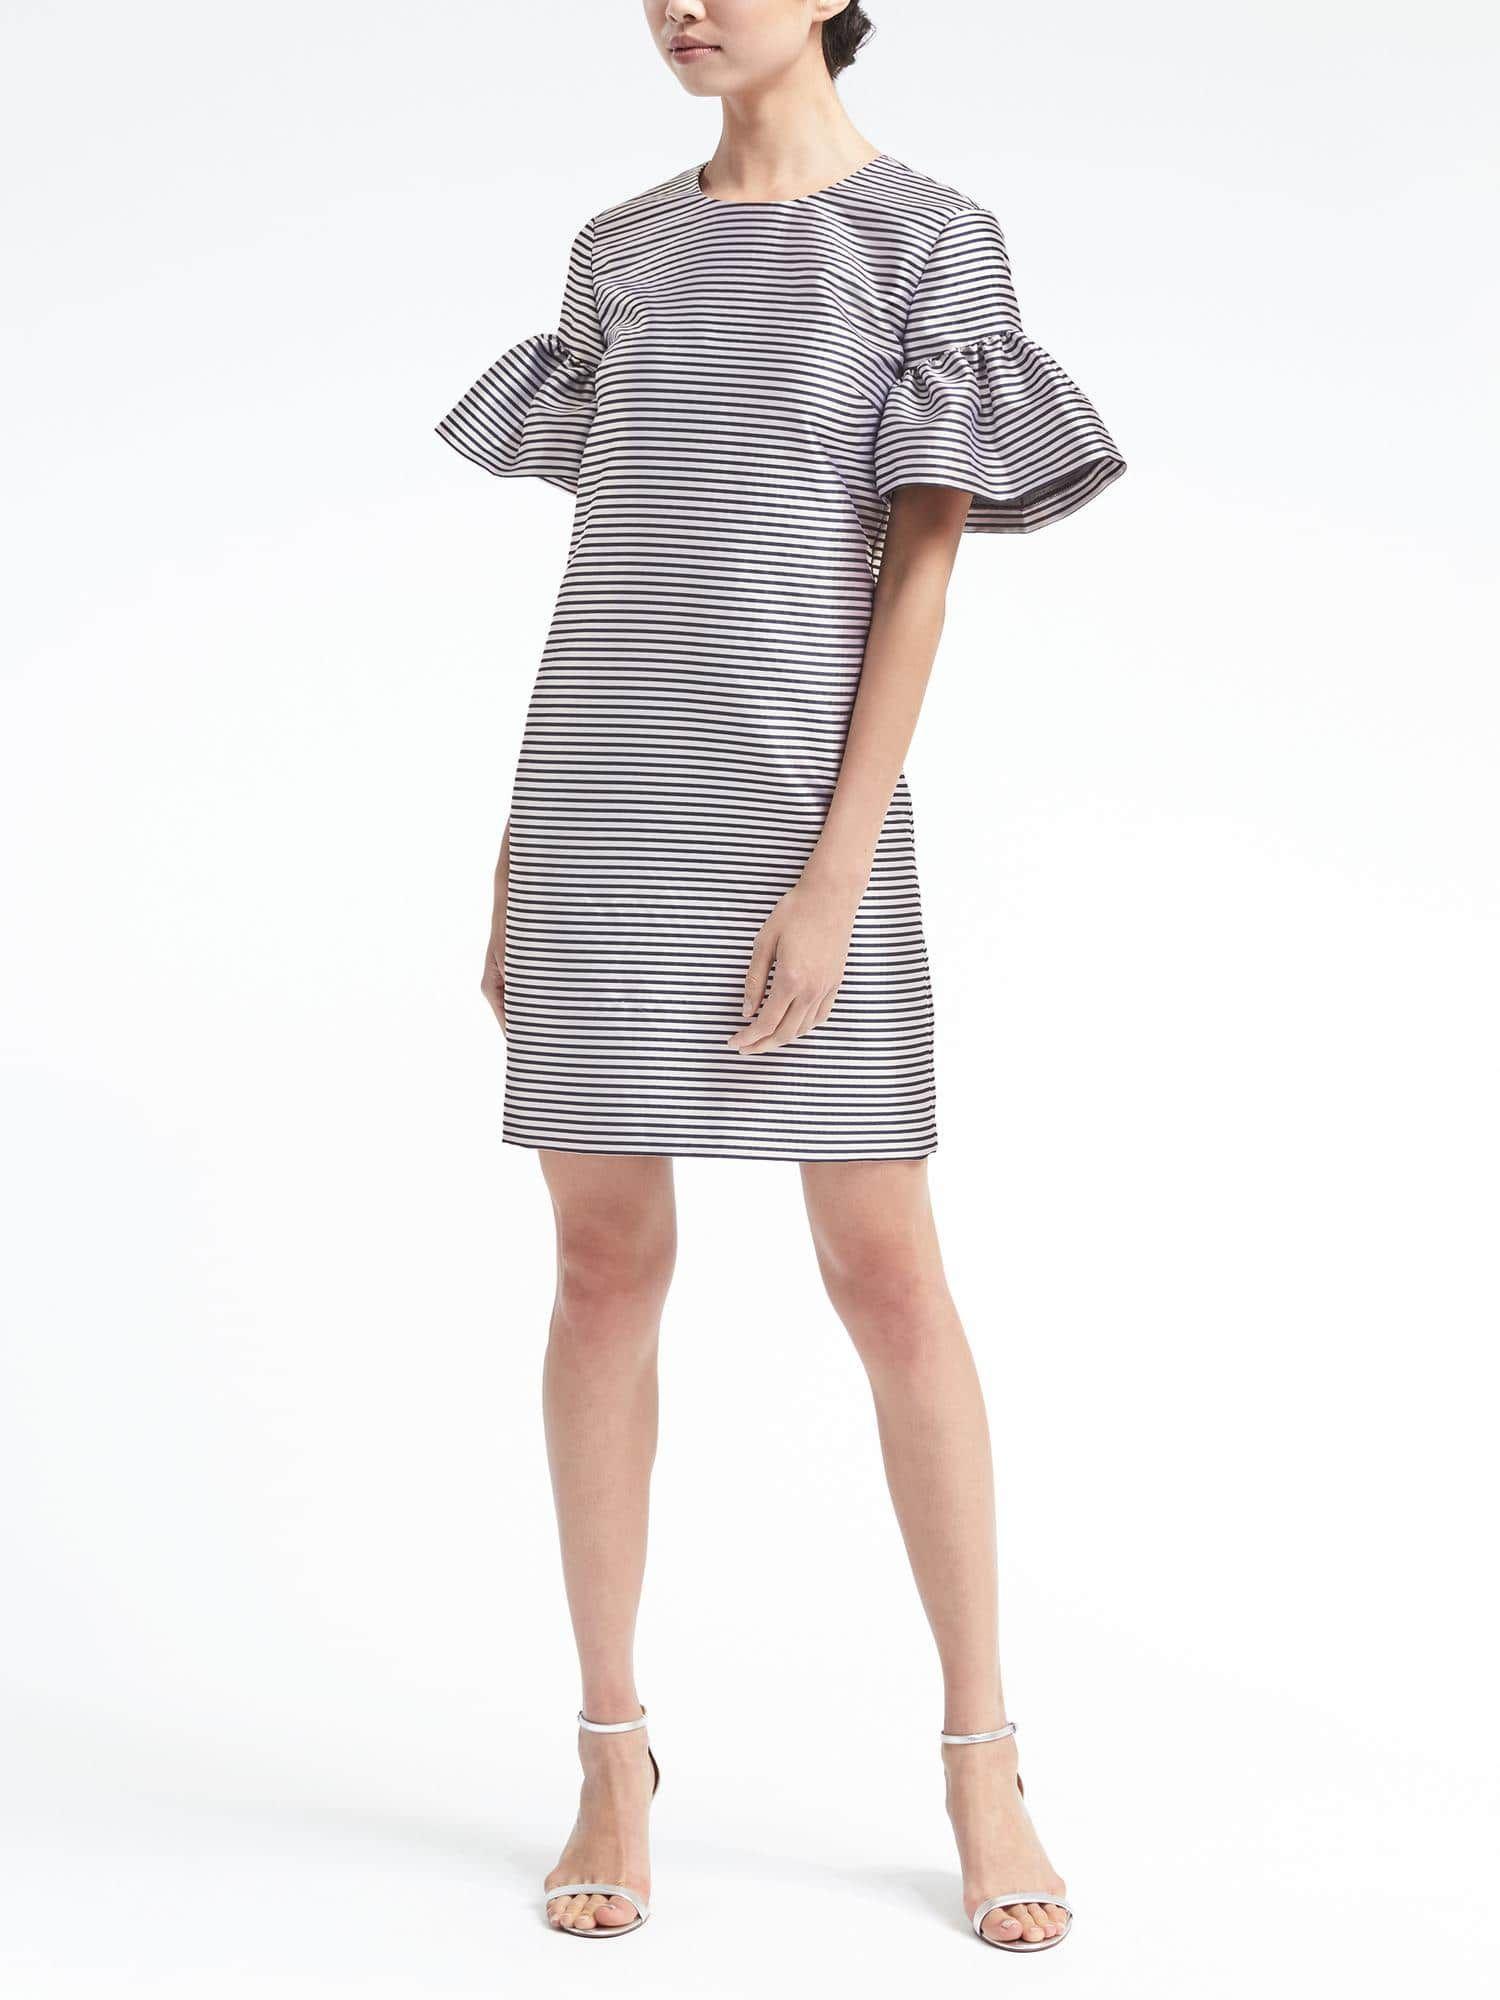 Stripe Ruffle Sleeve Shift Dress Banana Republic Refined Clothing Fashion Workplace Chic [ 2000 x 1500 Pixel ]